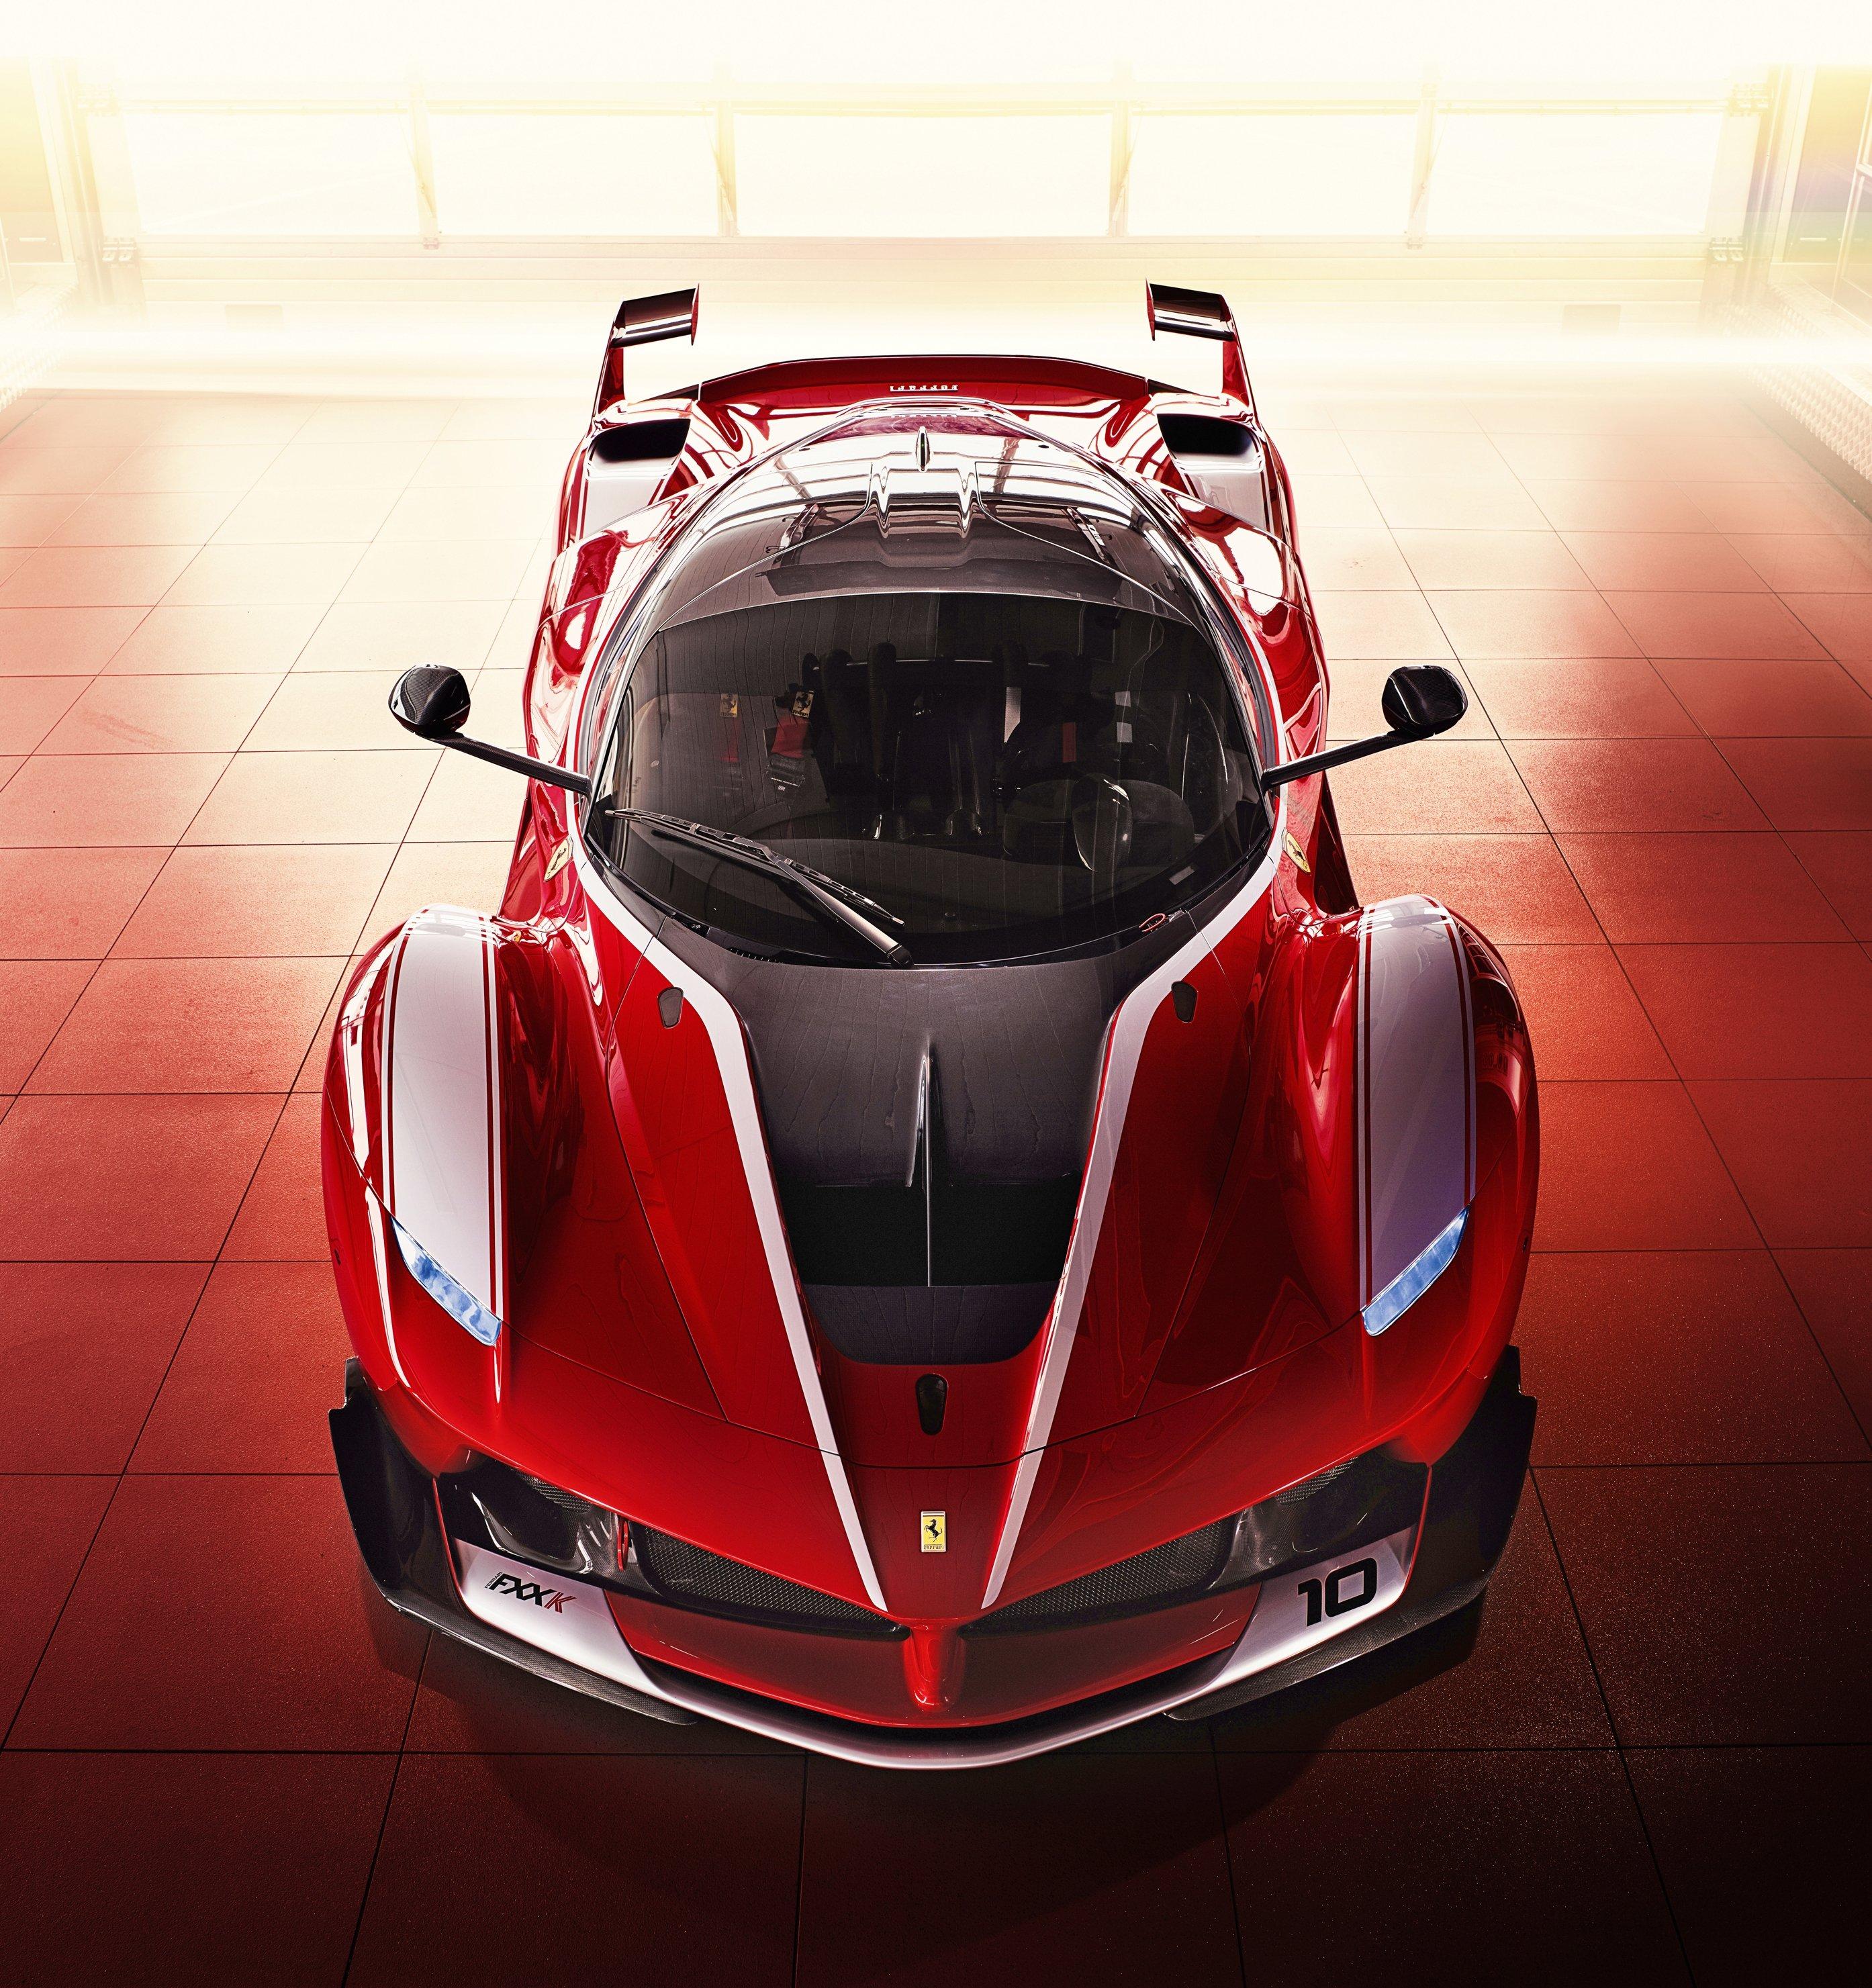 Ferrari Car Wallpaper: 2015 Ferrari FXX K Supercar Fxxk Wallpaper